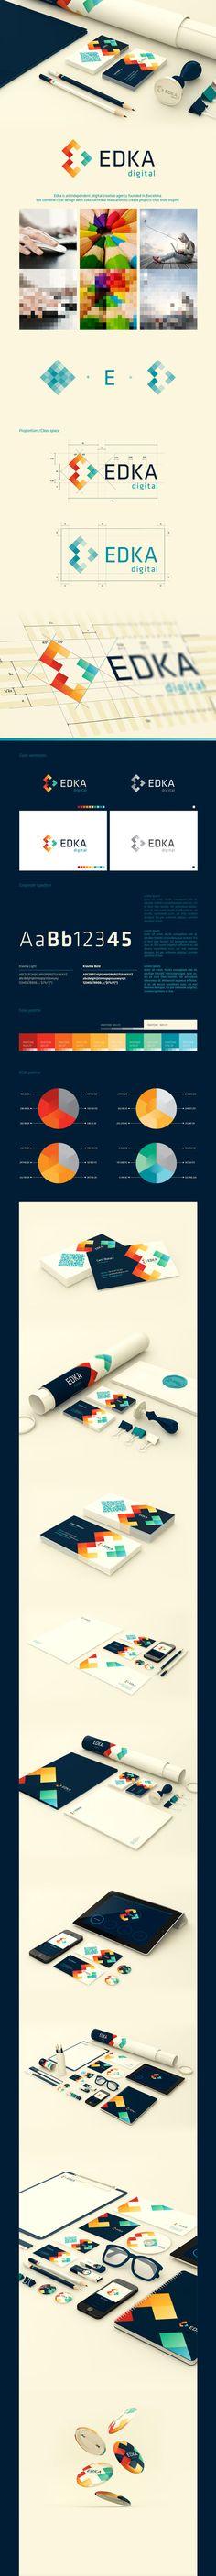 Visual Identity and Branding Series : Edka Digital